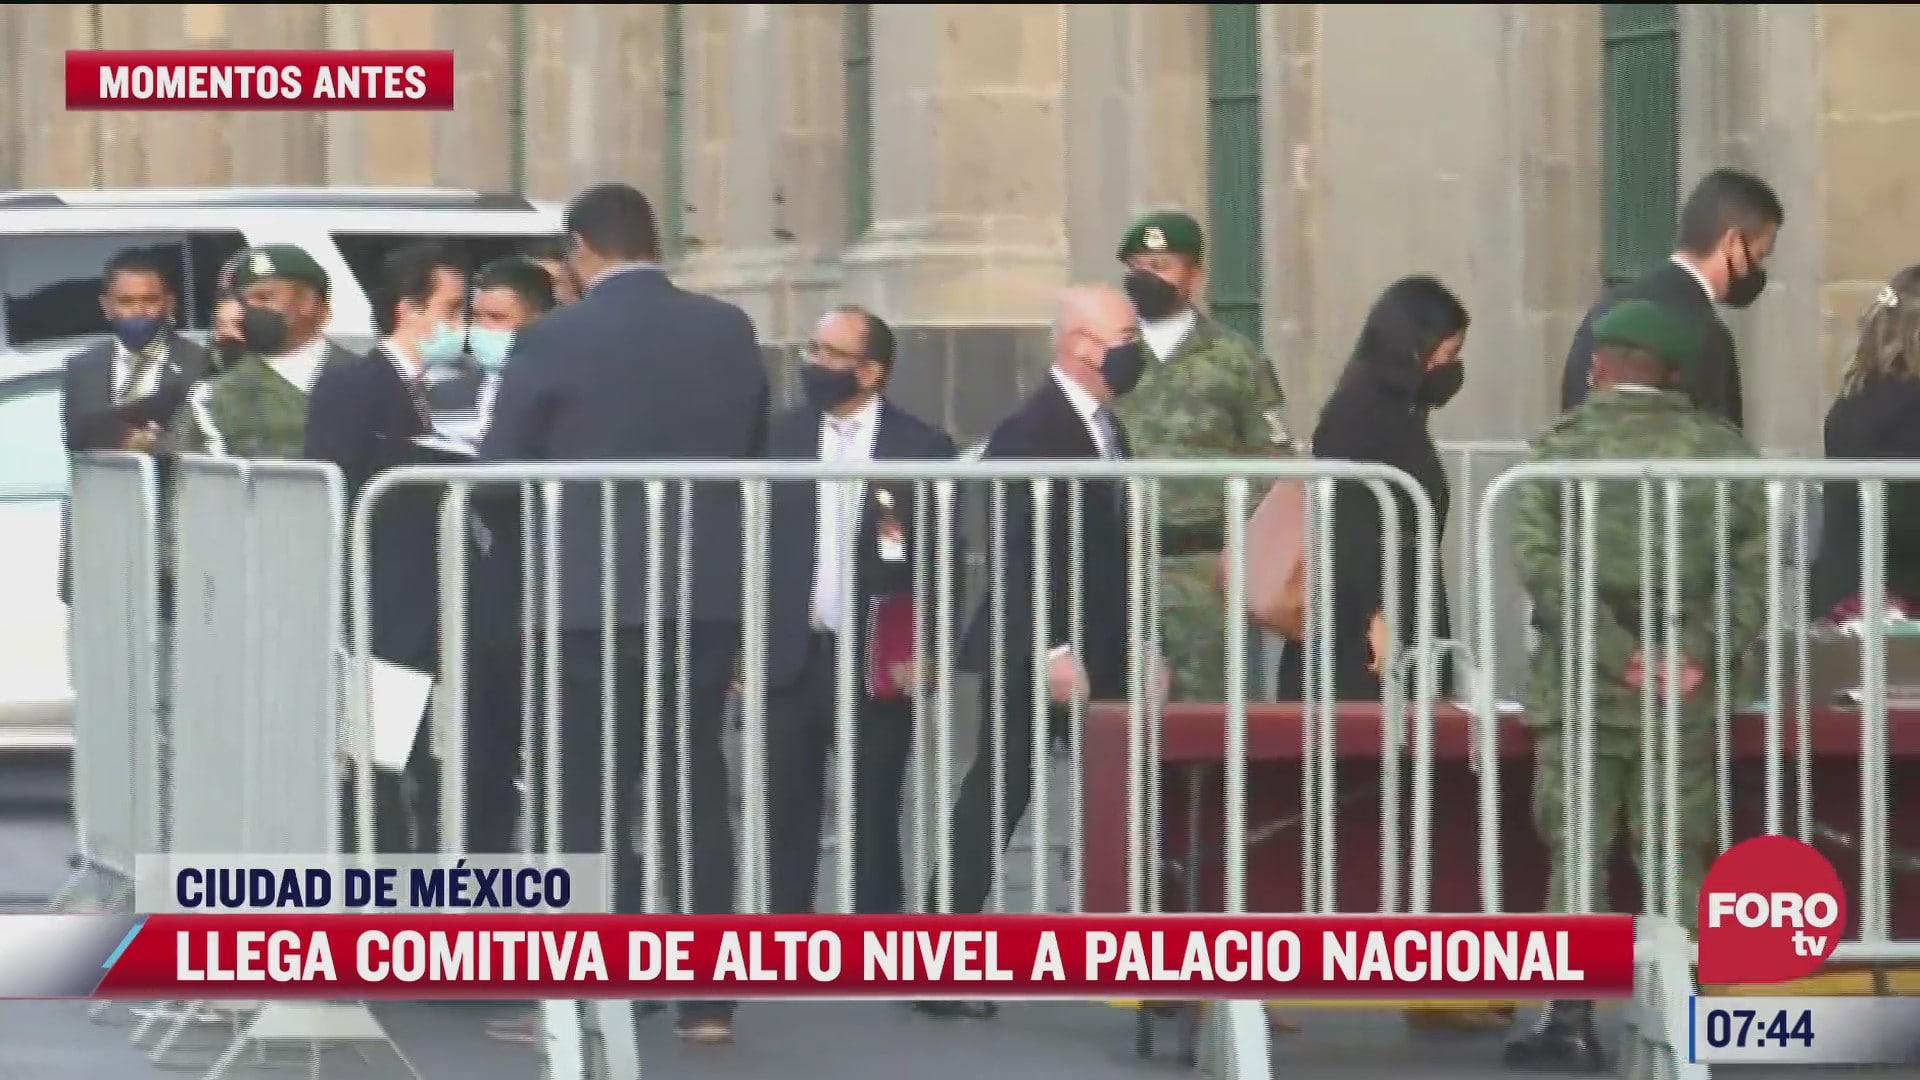 llega comitiva de eeuu de alto nivel a palacio nacional en cdmx